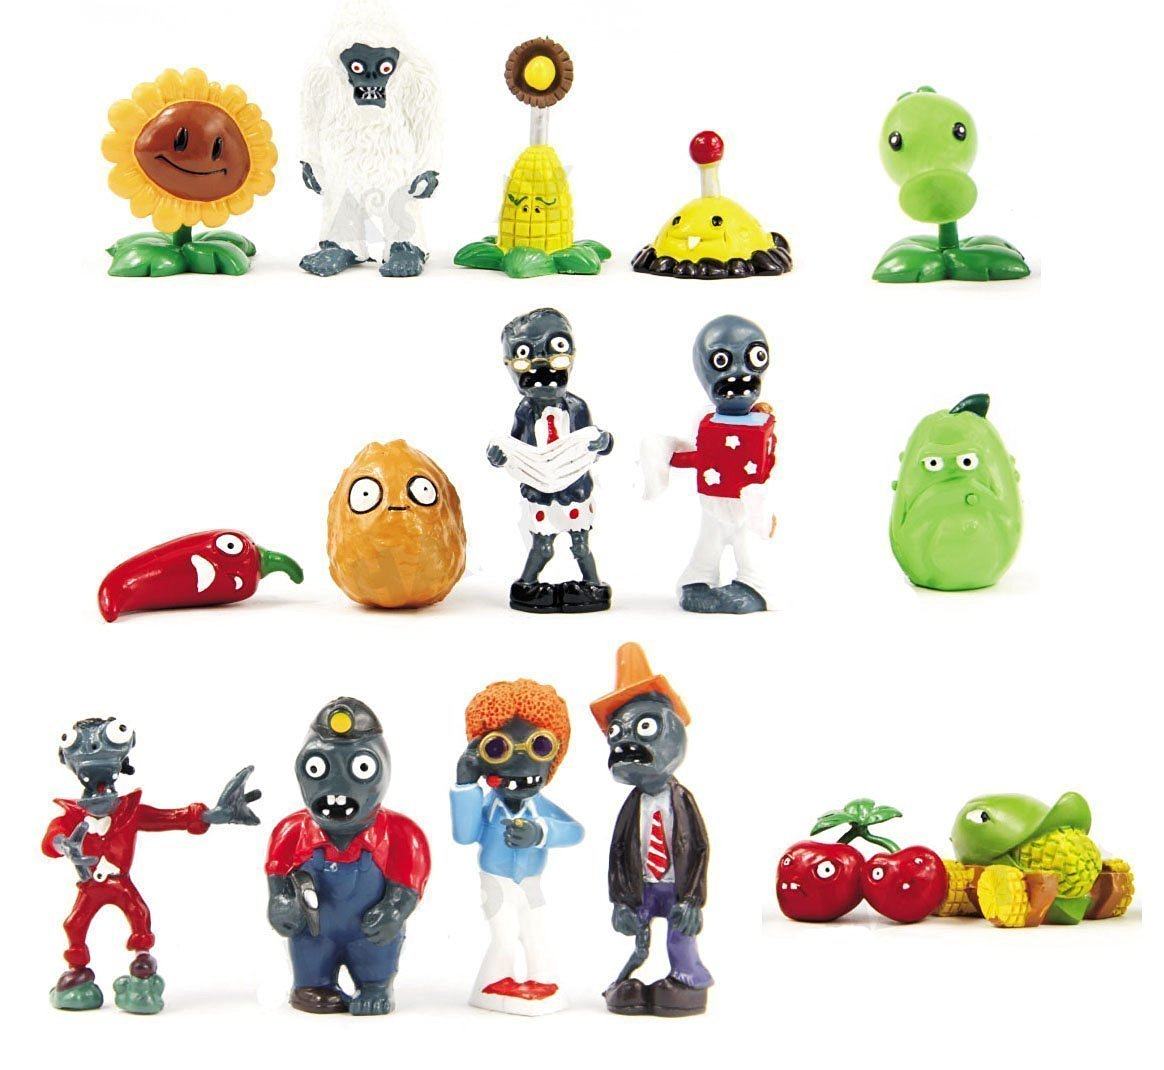 BIGOCT BIGOCT BIGOCT 16 X Plants vs Zombies Toys Series Game Role Figure Display Toy PVC Gargantuar Craze Dave Dr. Zomboss Action Figure 74bc95